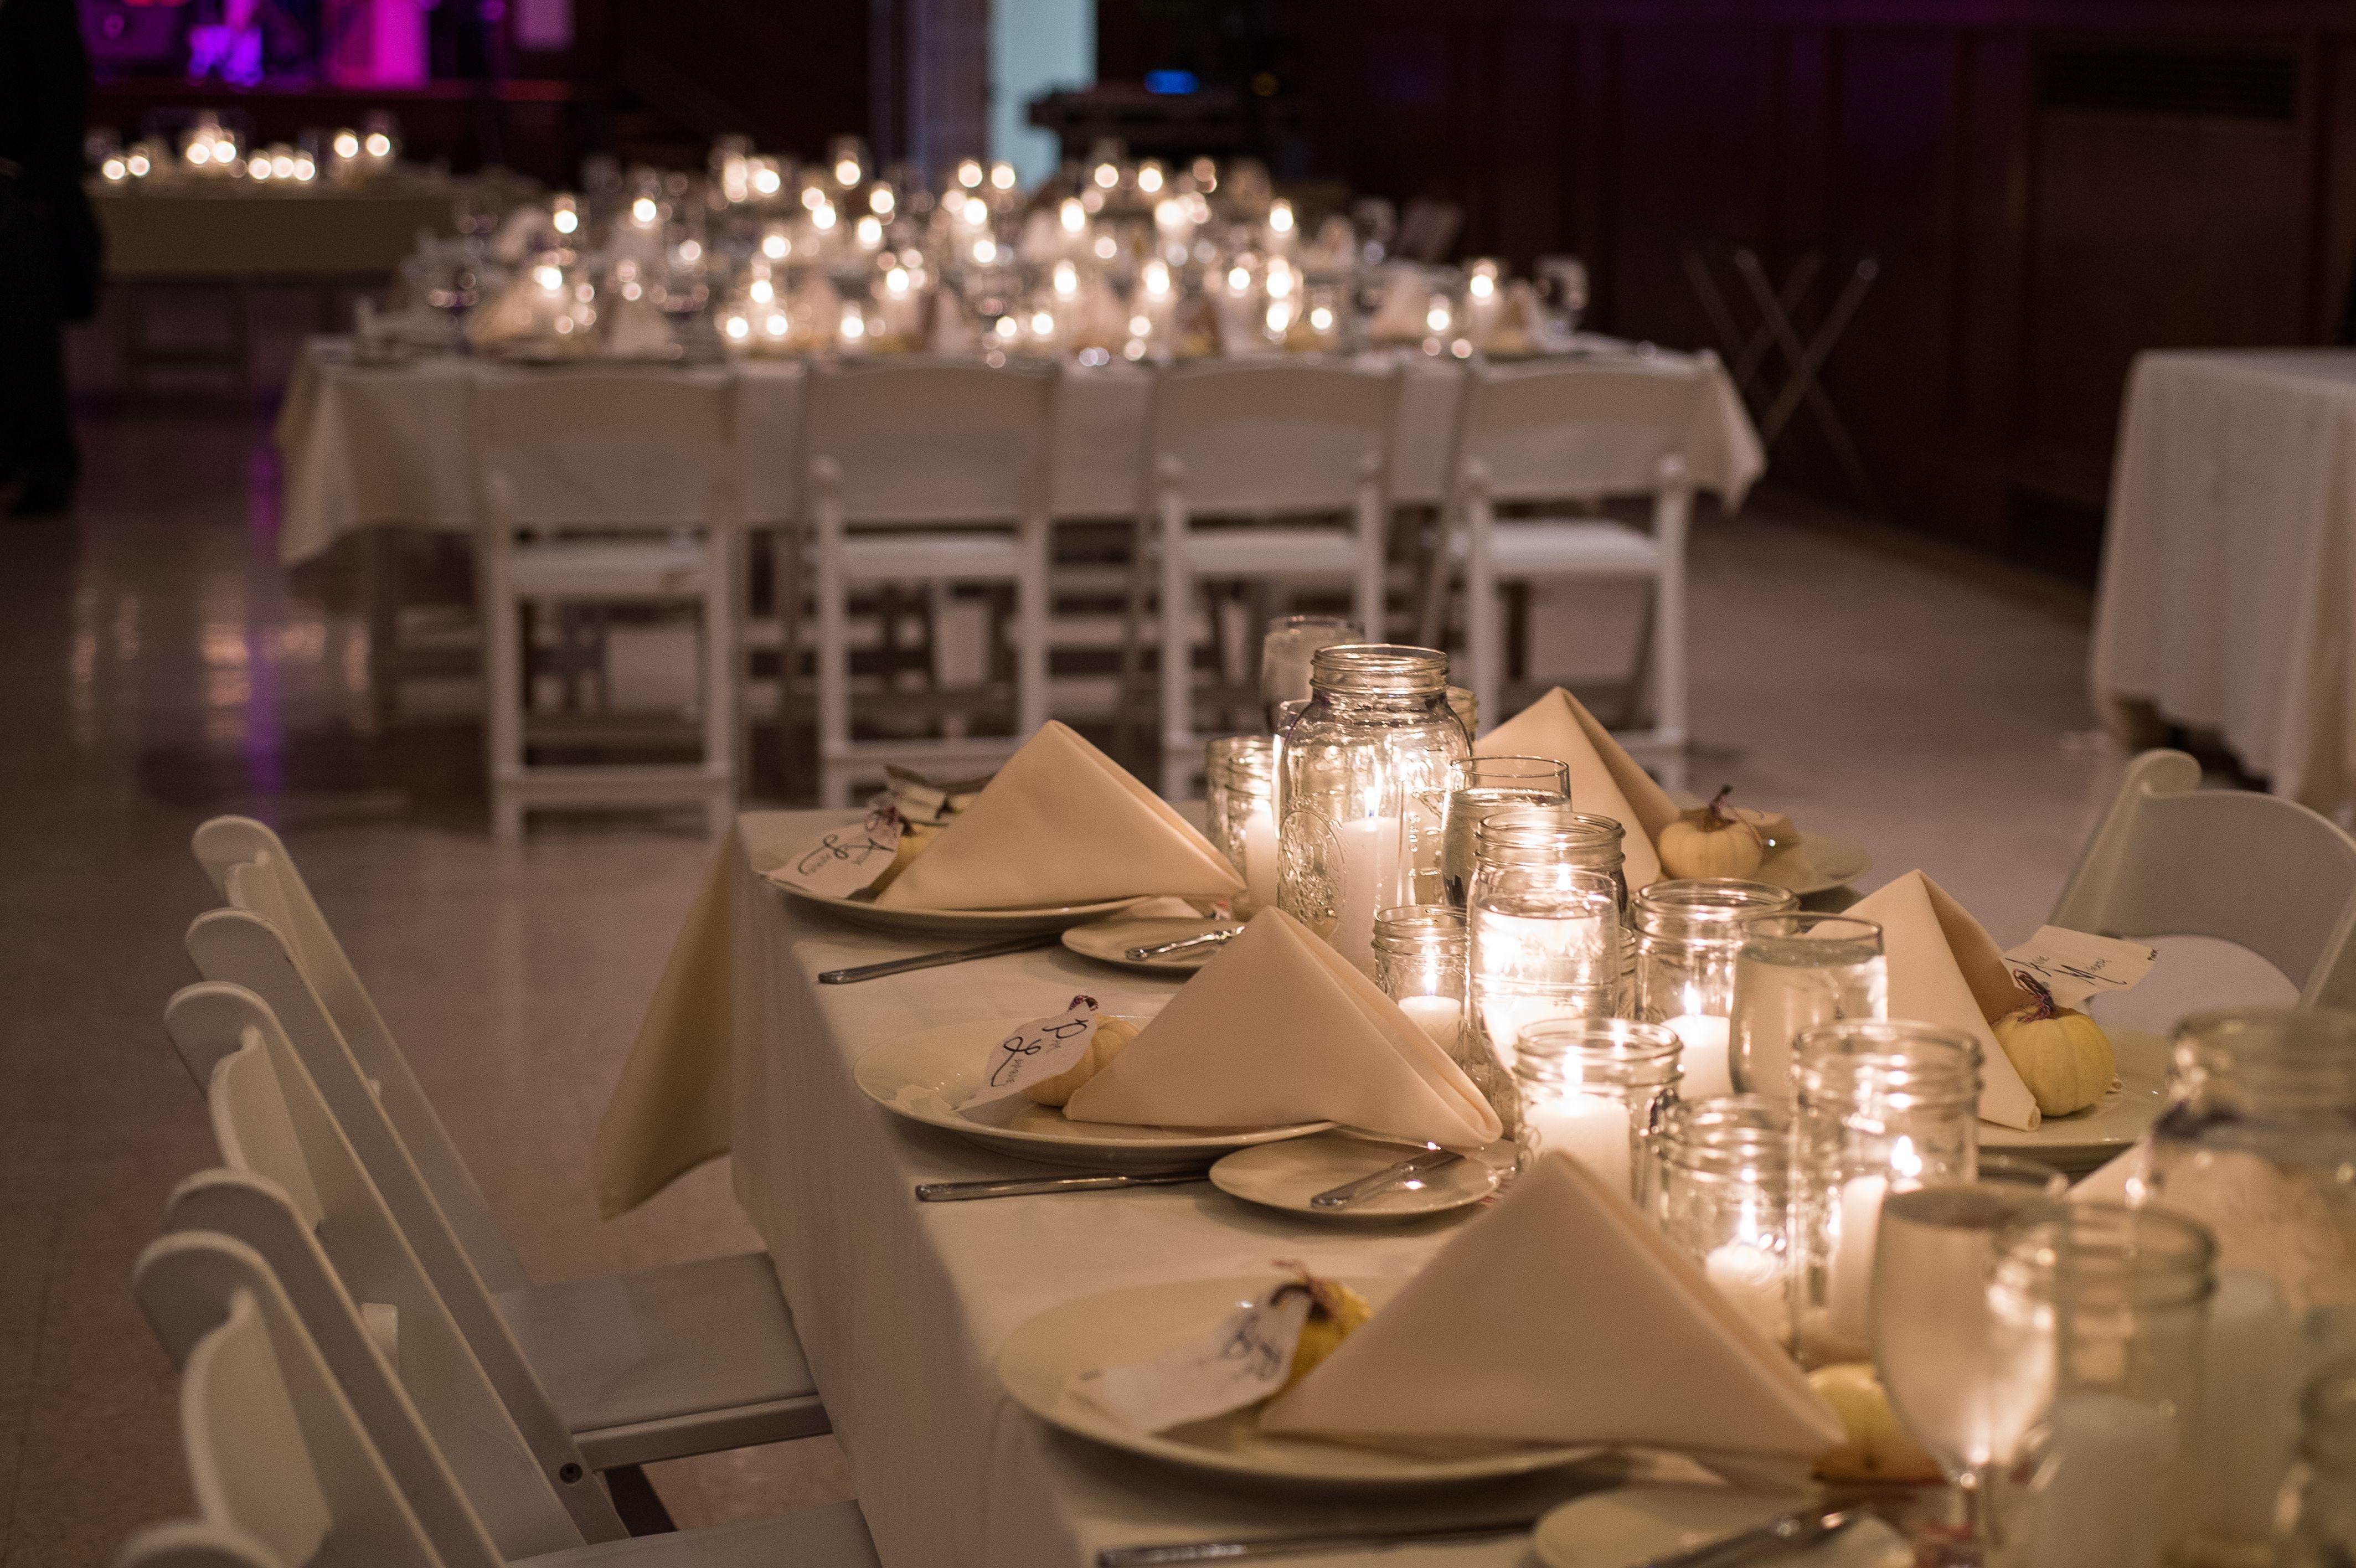 Autumn Wedding Table Centerpieces Shabbychic Rustic Whites